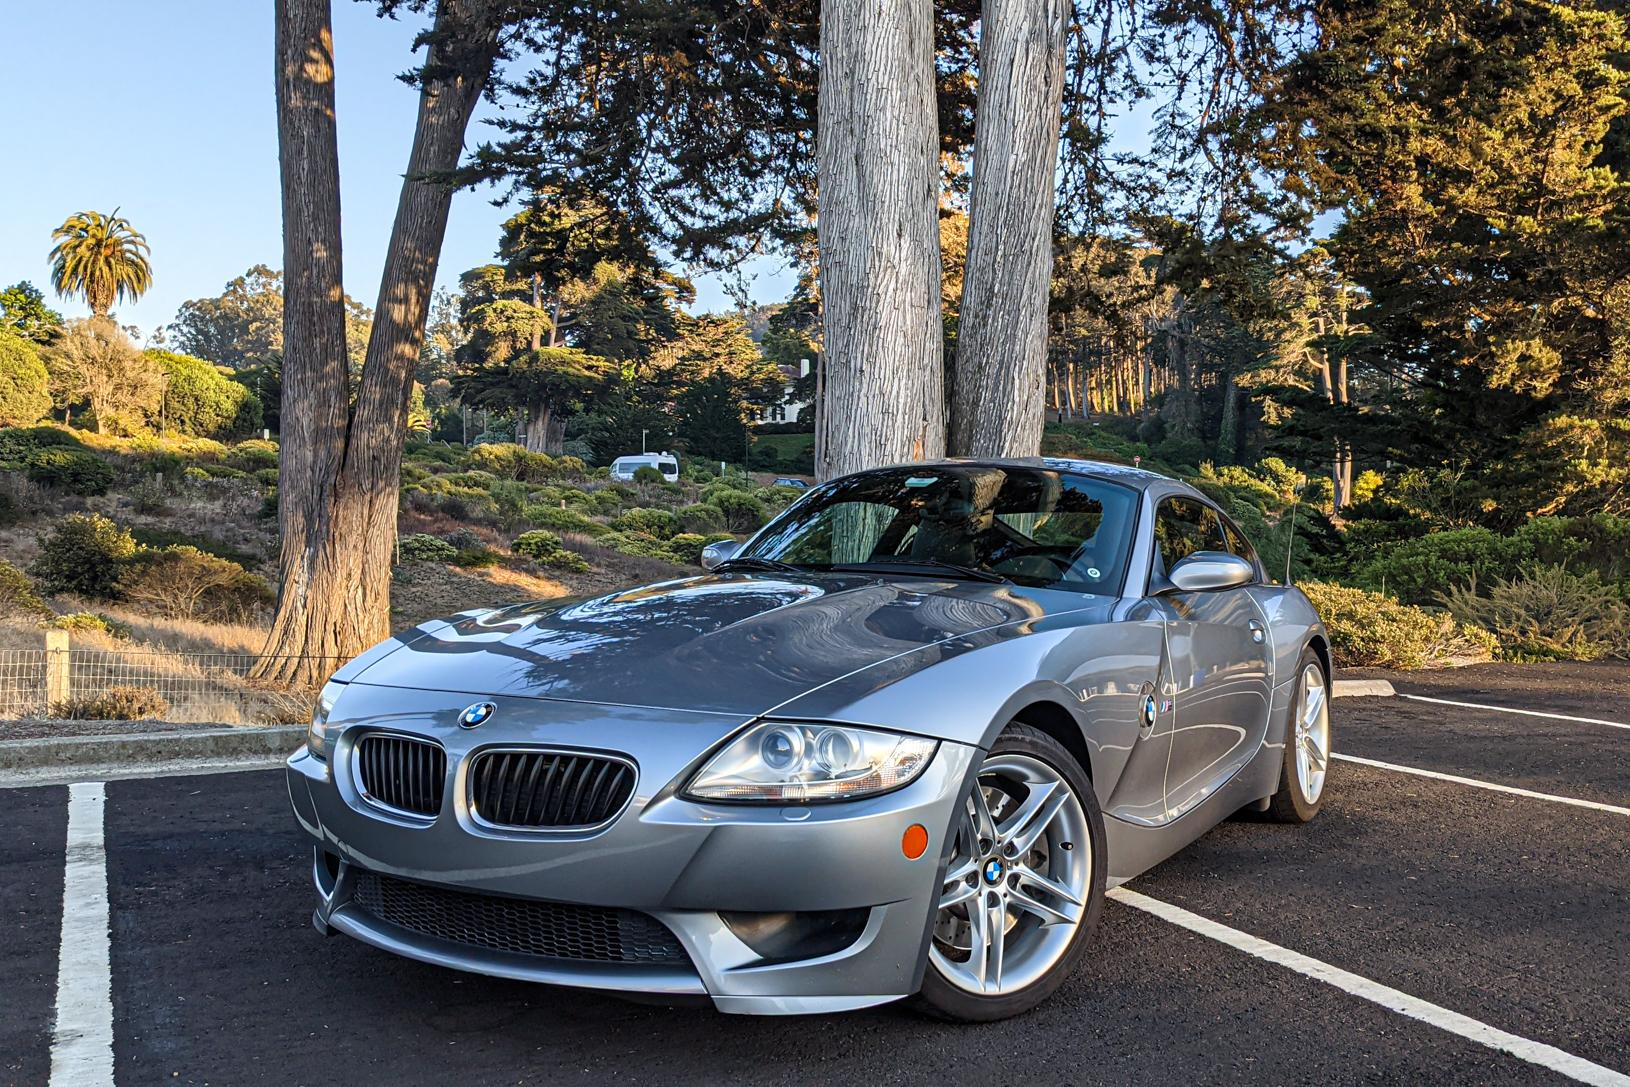 2006 BMW Z4 M-Coupe